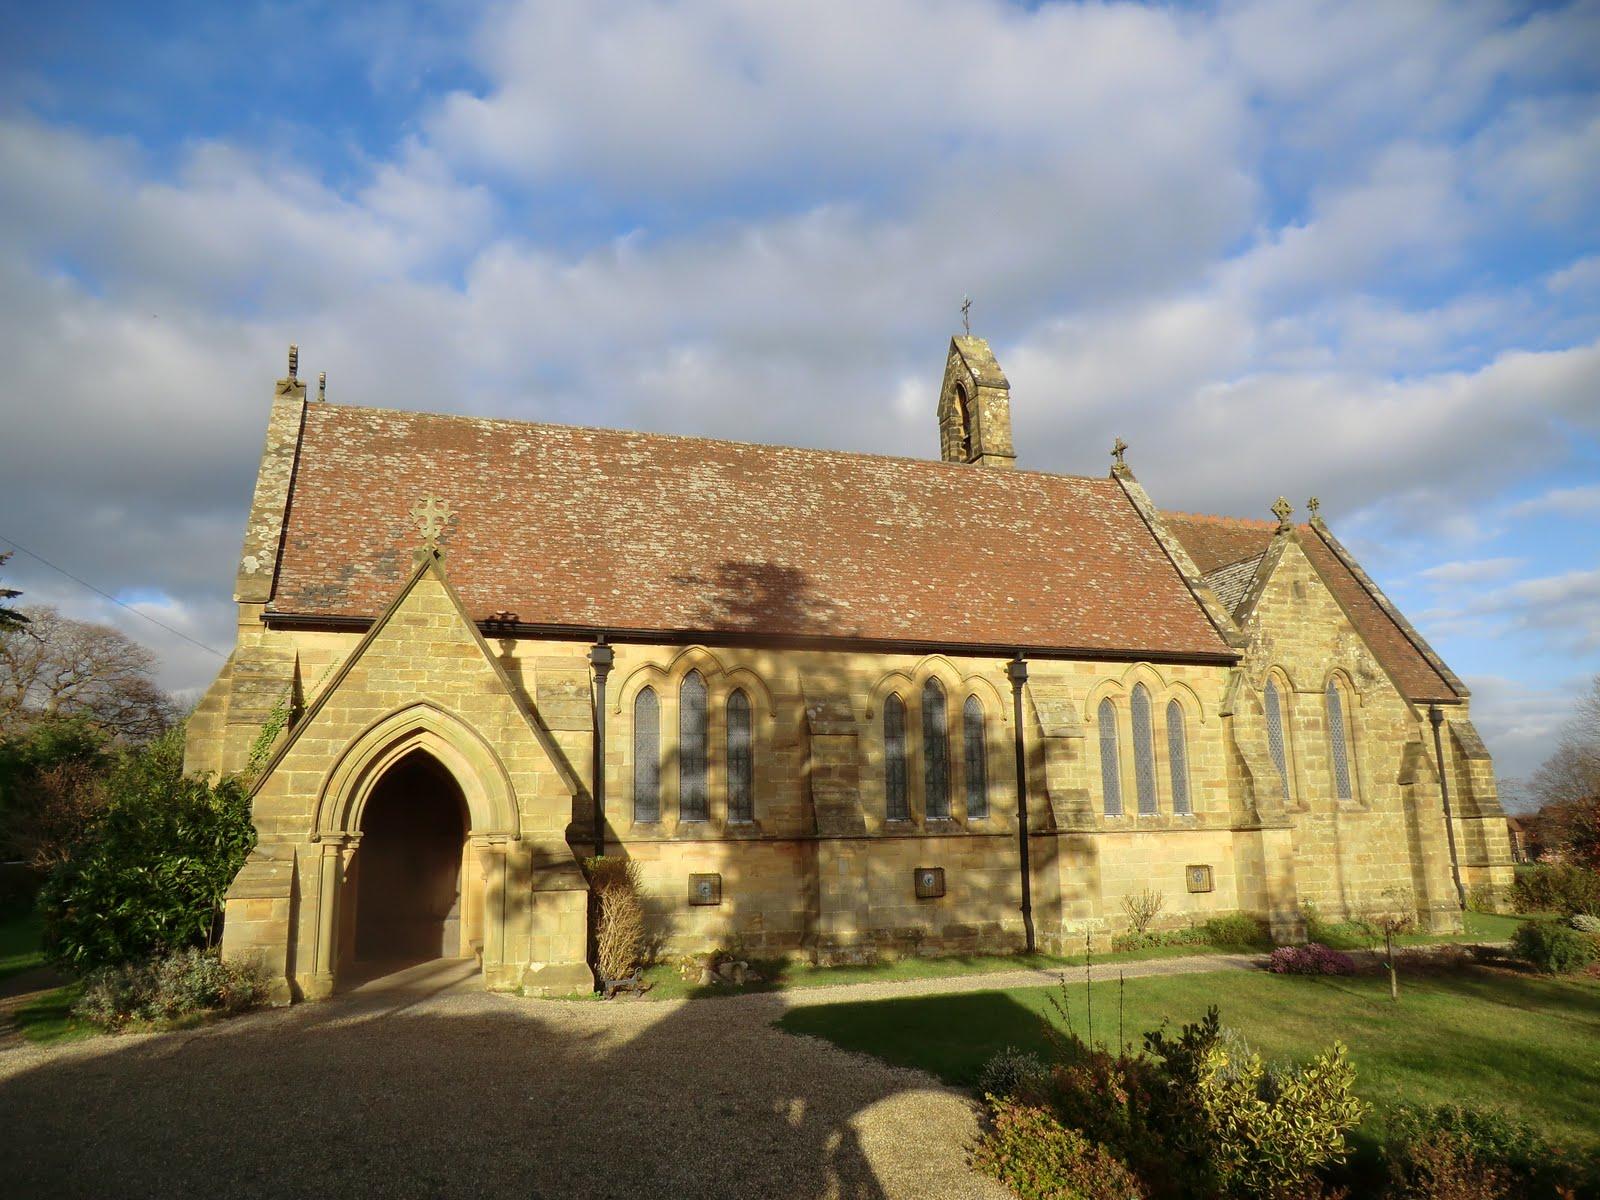 CIMG1740 All Saints church, Langton Green